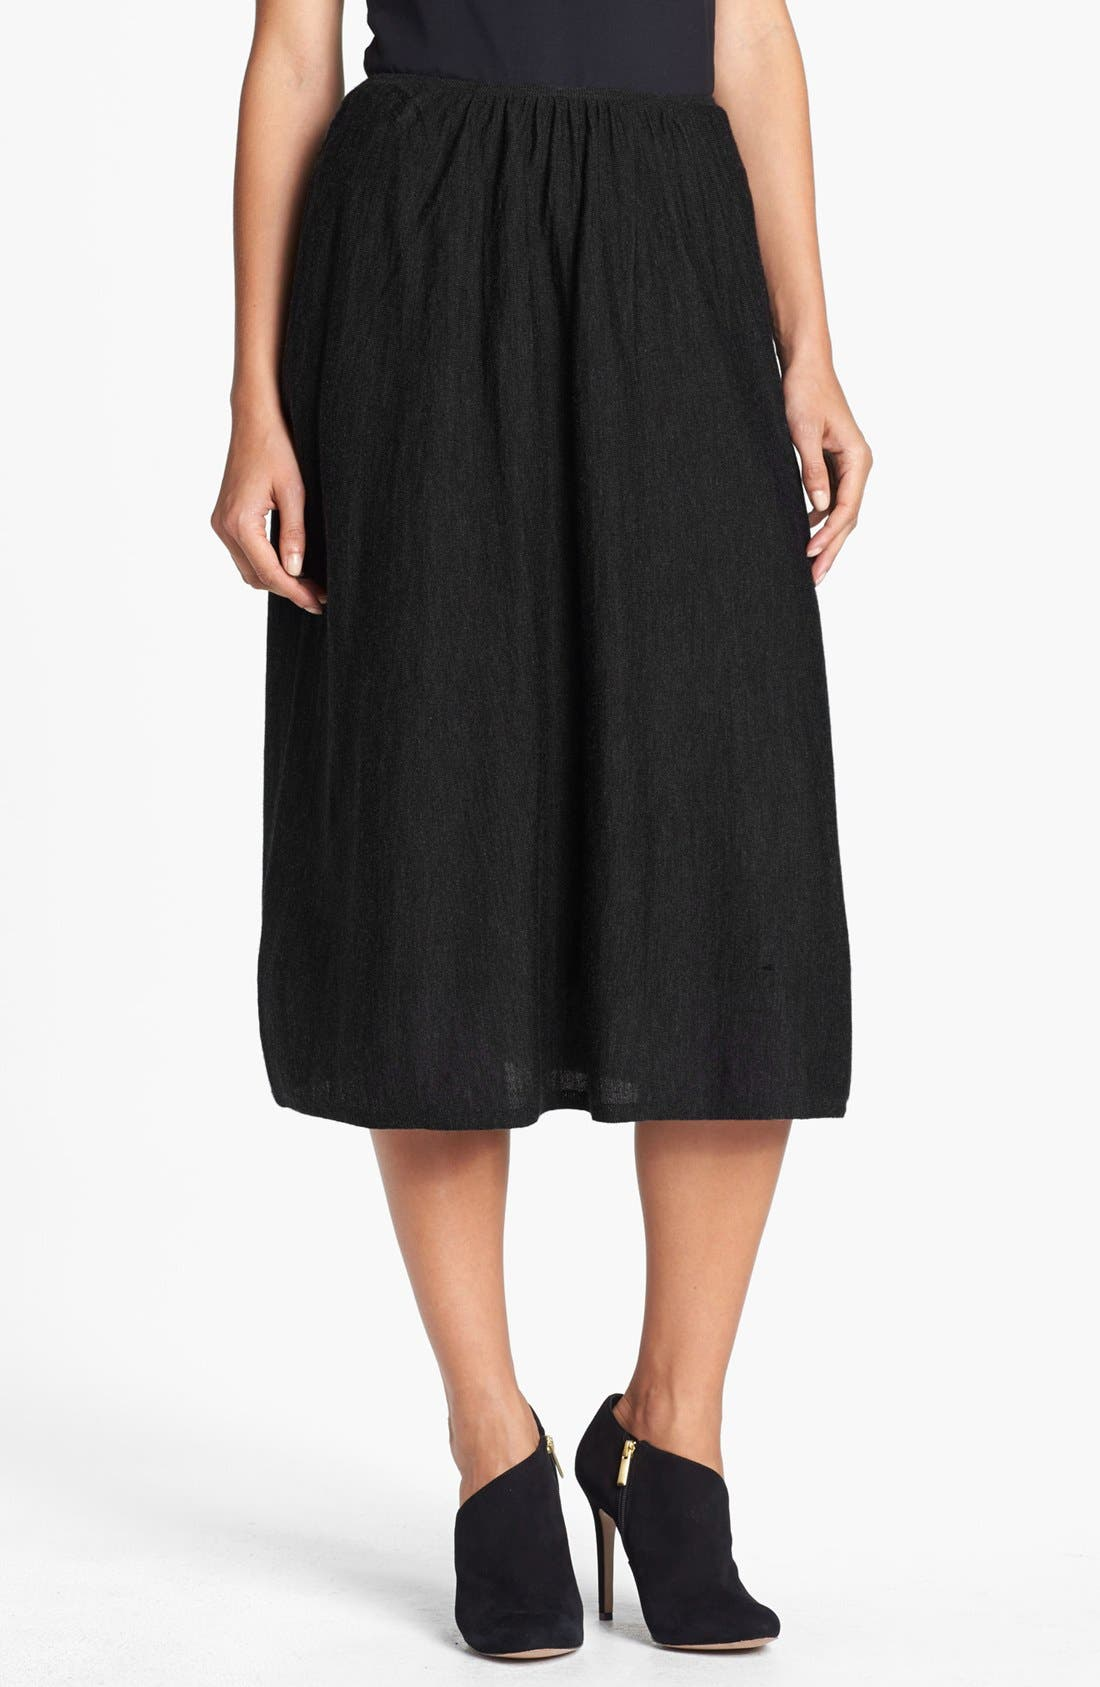 EILEEN FISHER Merino Wool Jersey Skirt, Main, color, 001